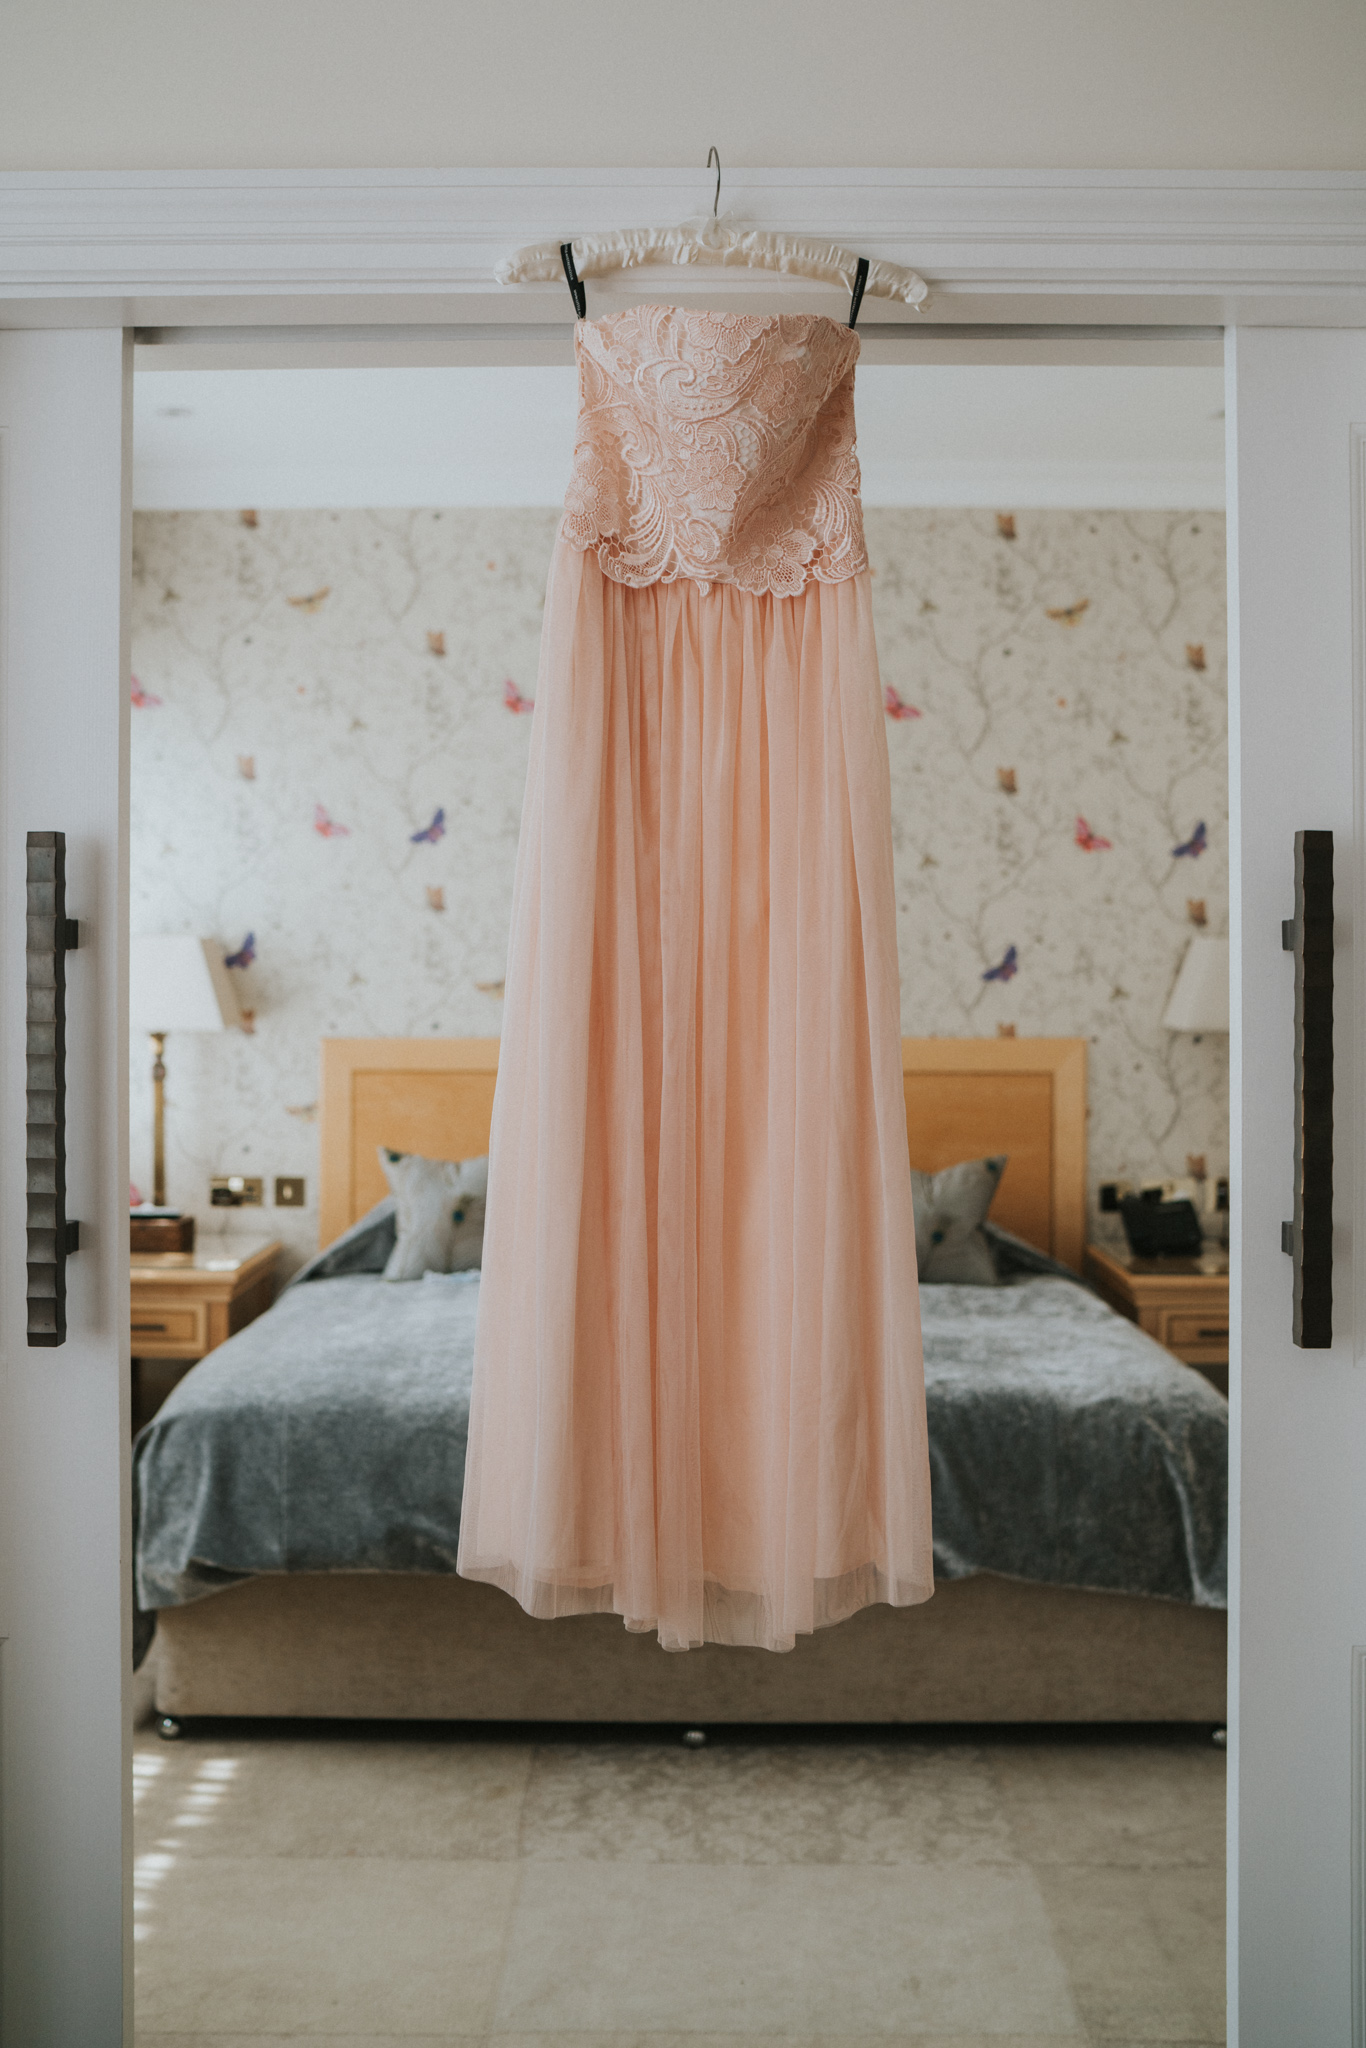 Grace-Elizabeth-Georgie-Amalaketu-Firstsite-Colchester-Essex-Boho-Buddhist-Wedding-Alternative-Wedding-Photography-Essex (8 of 100).jpg